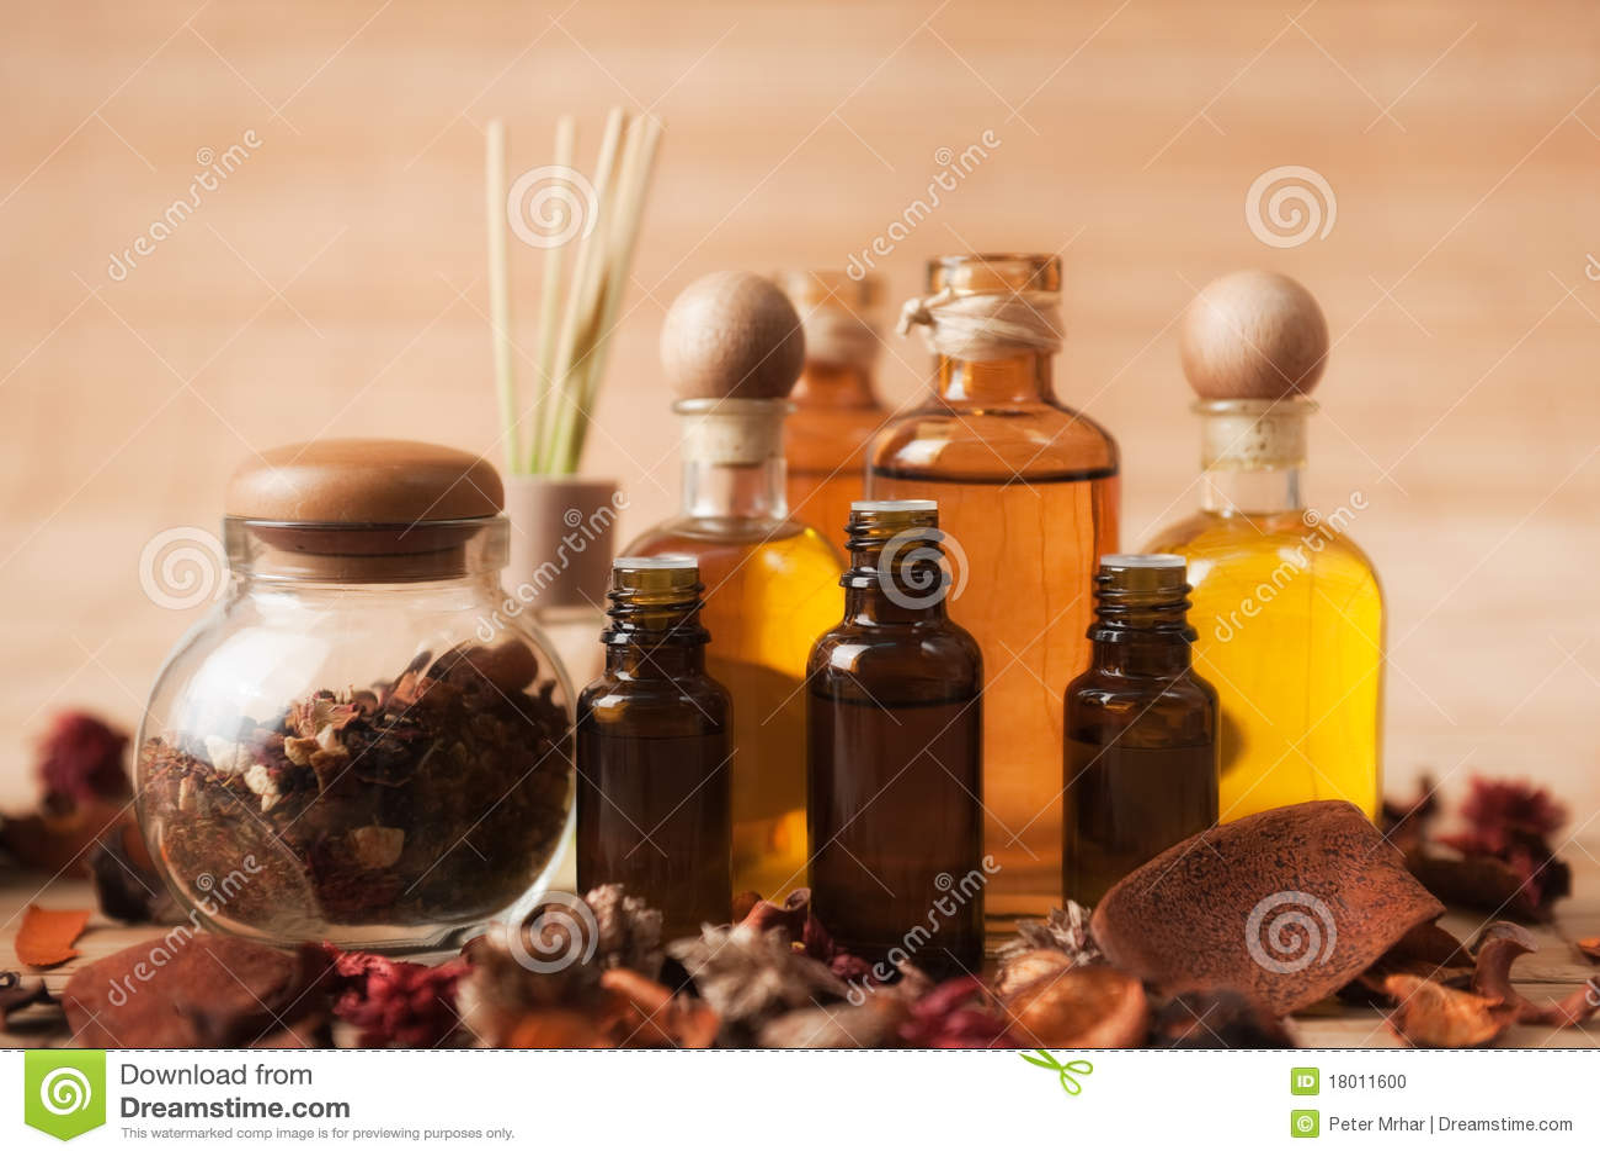 De Levering van Aromatherapy